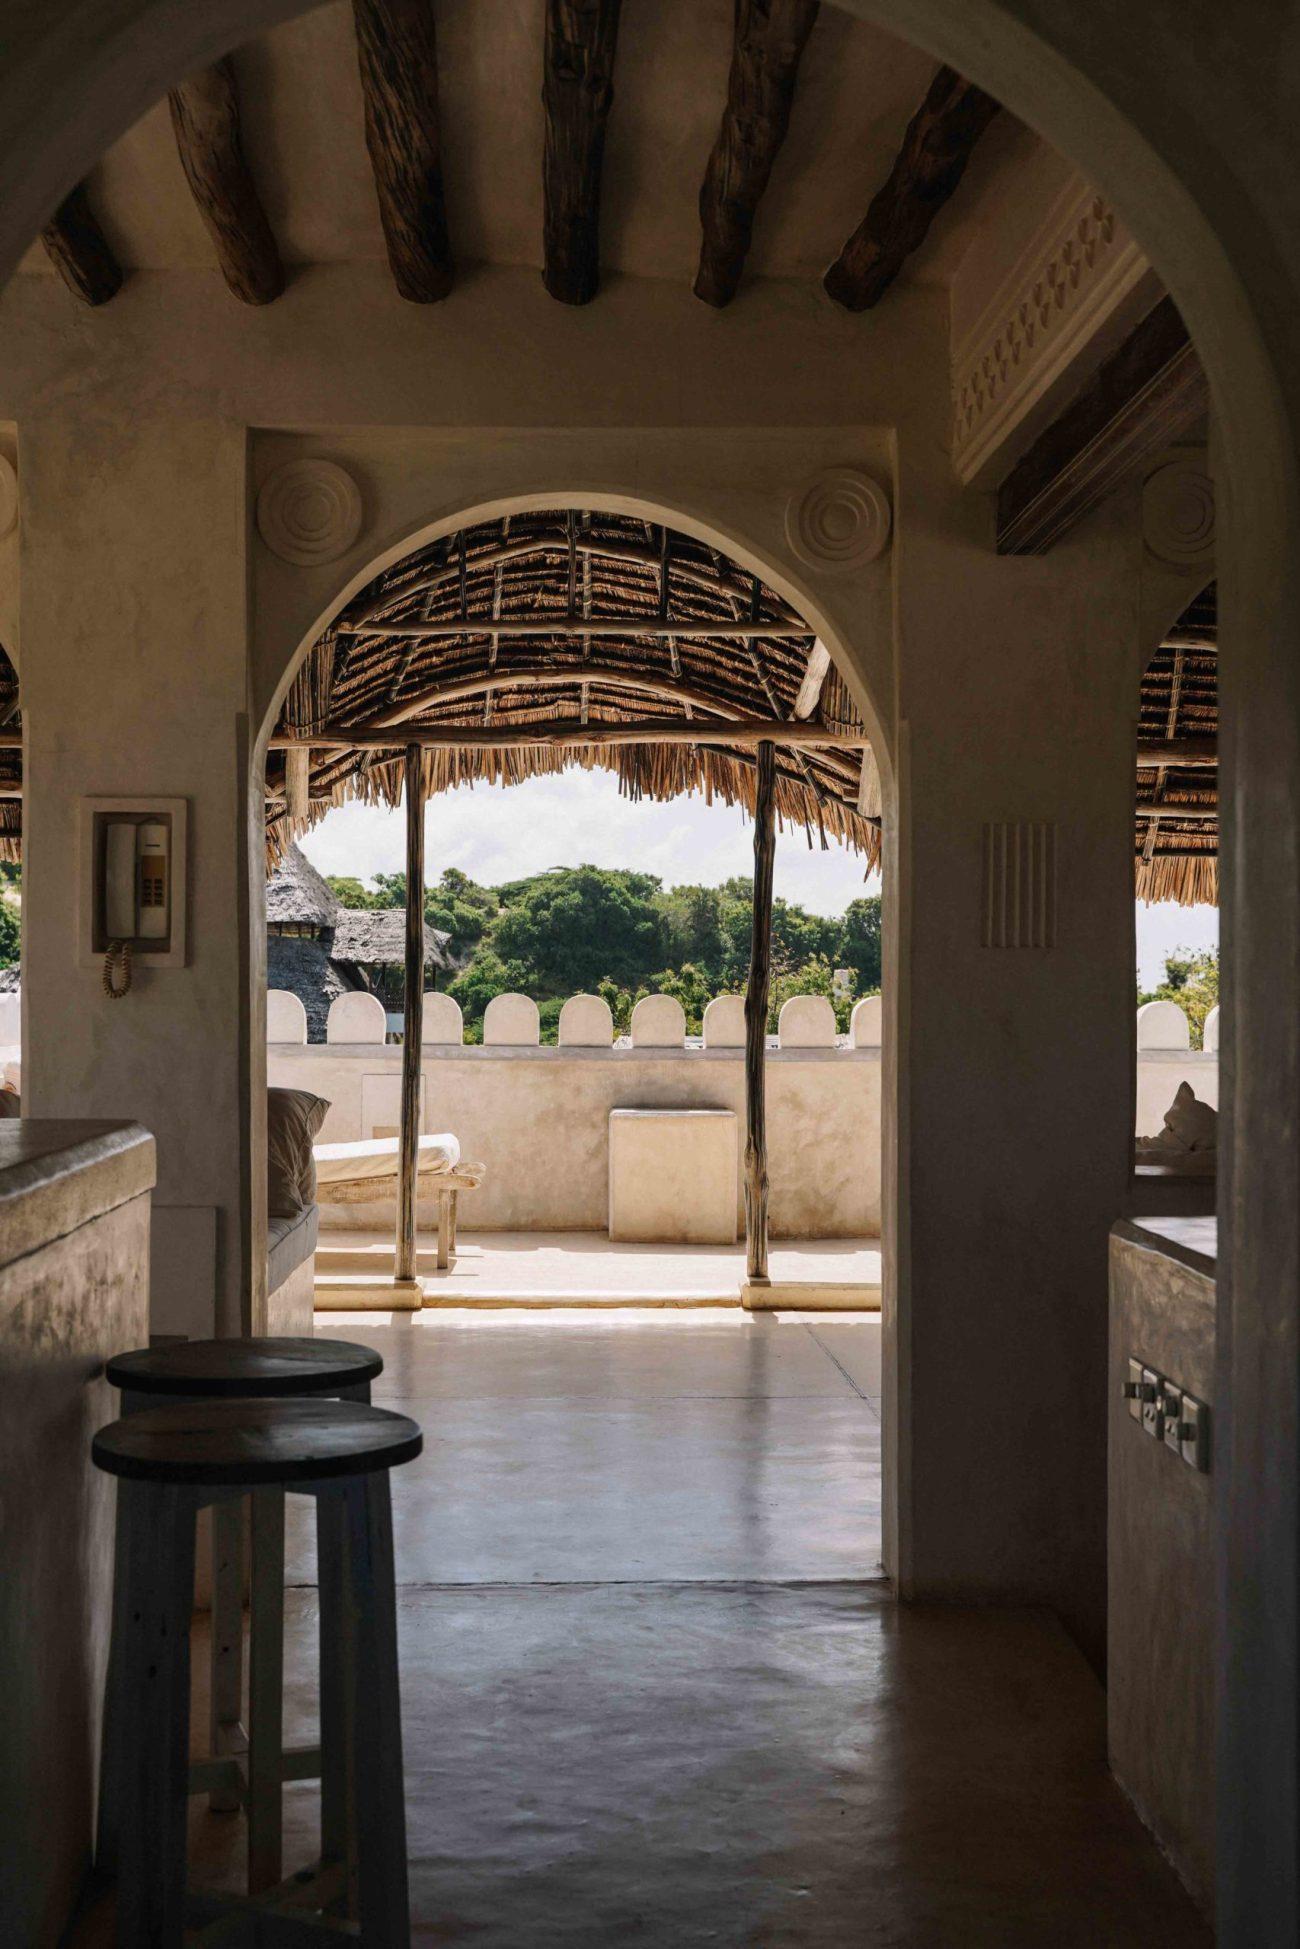 voyage au kenya, lamu et shela